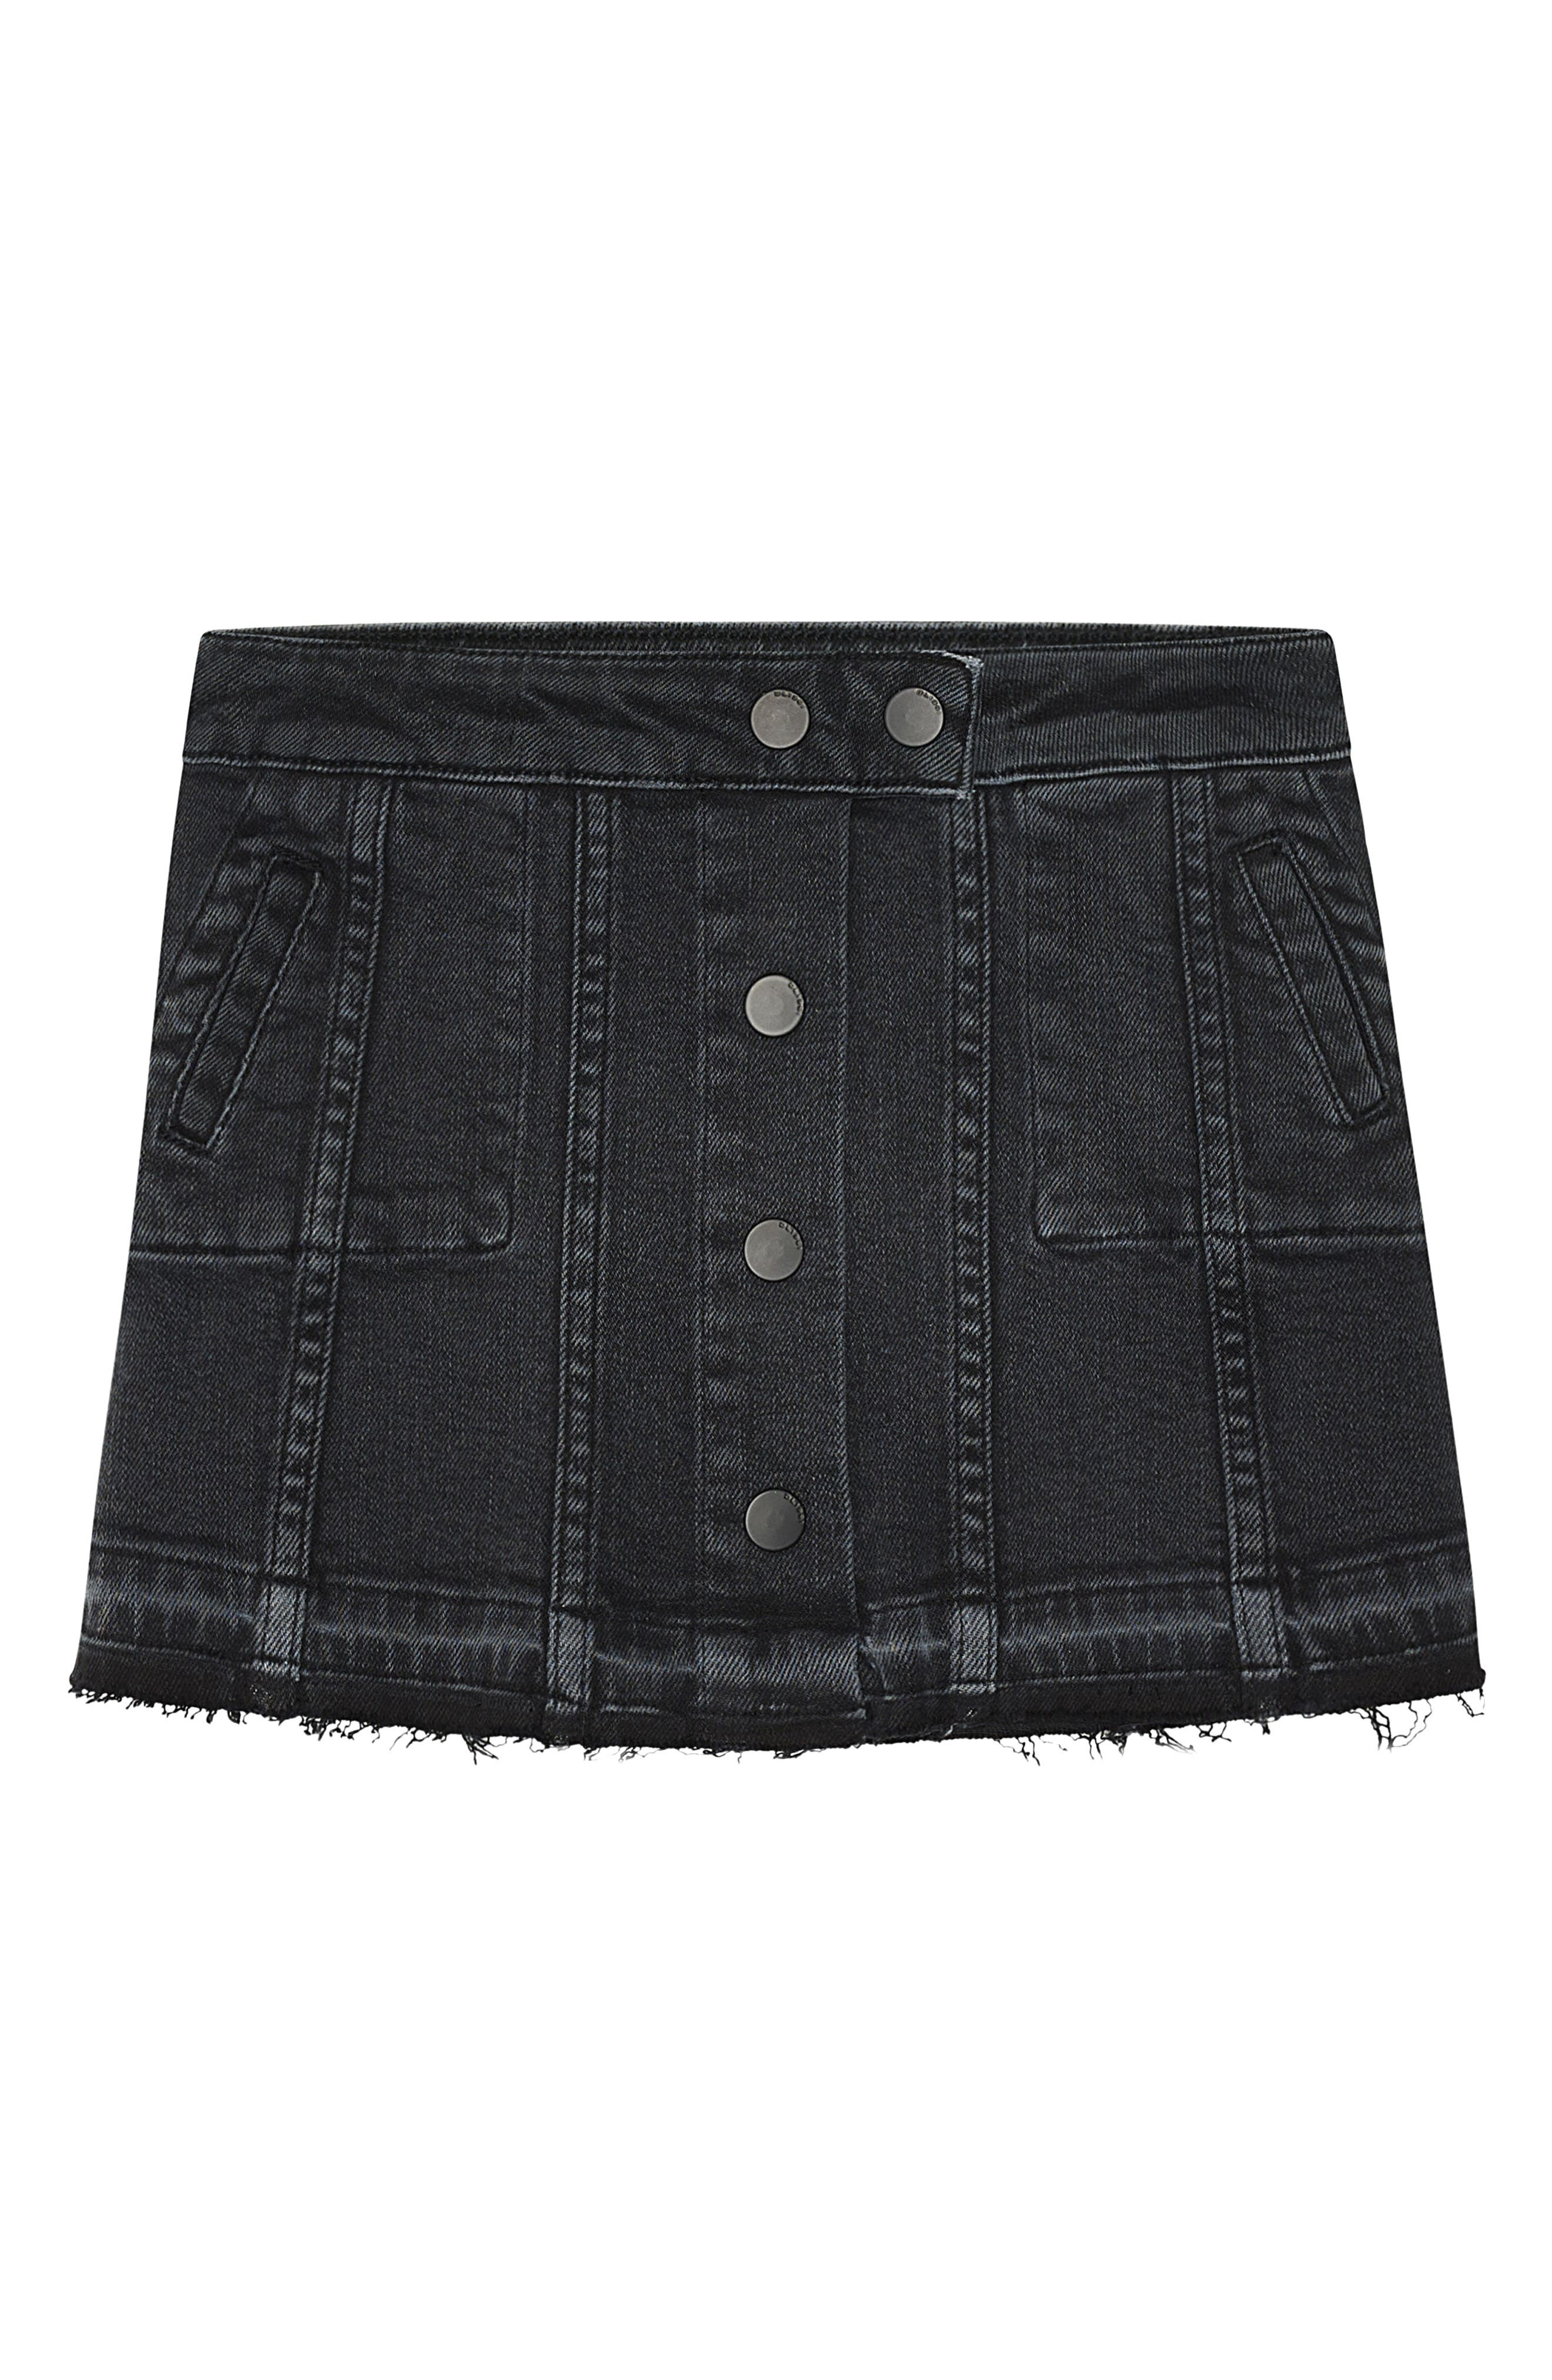 Jenny Cutoff Denim Skirt,                             Main thumbnail 1, color,                             001